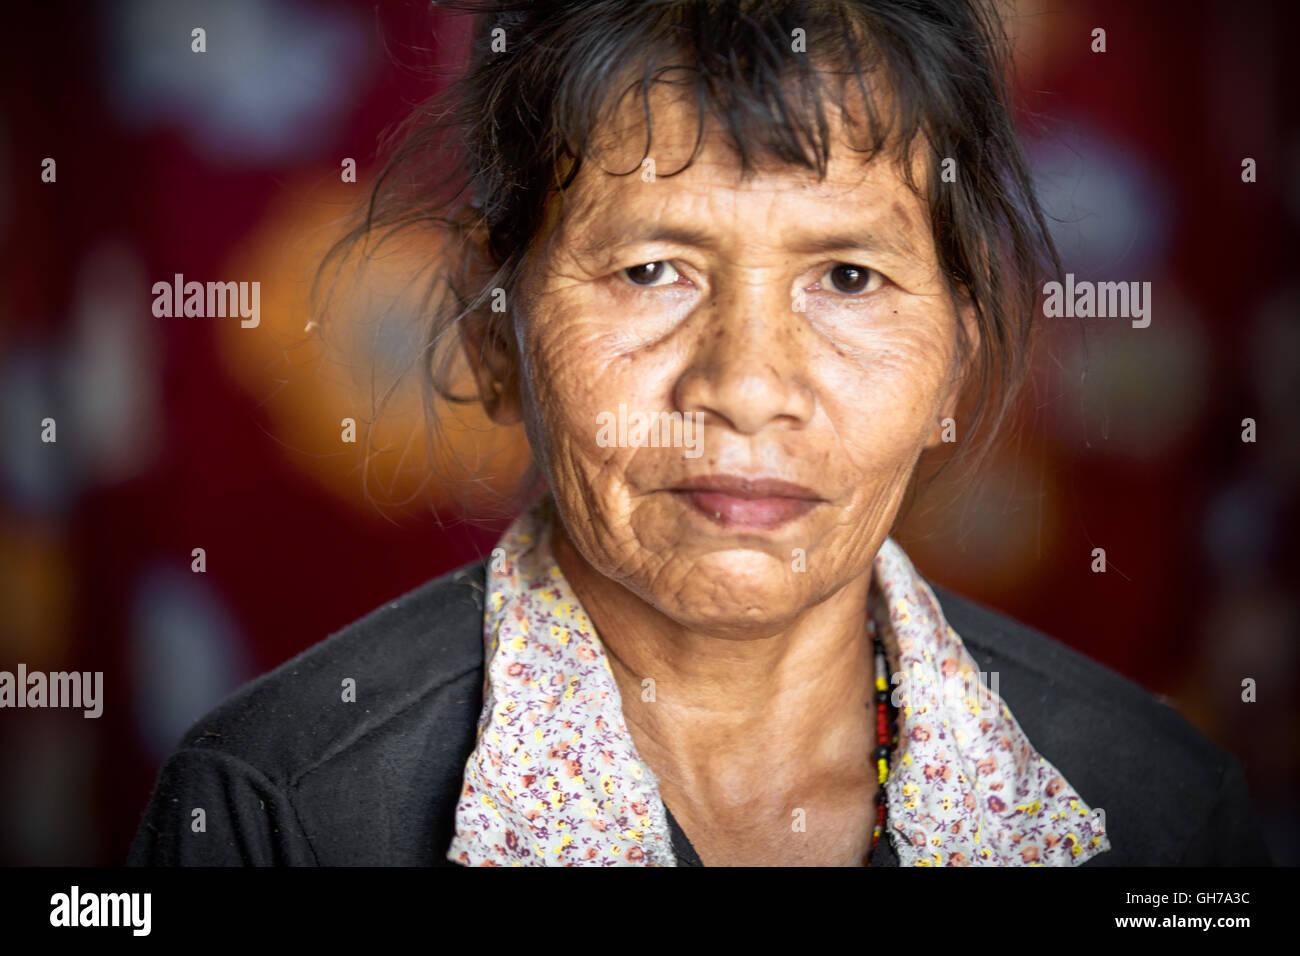 Ata Tribe Stock Photos & Ata Tribe Stock Images - Alamy